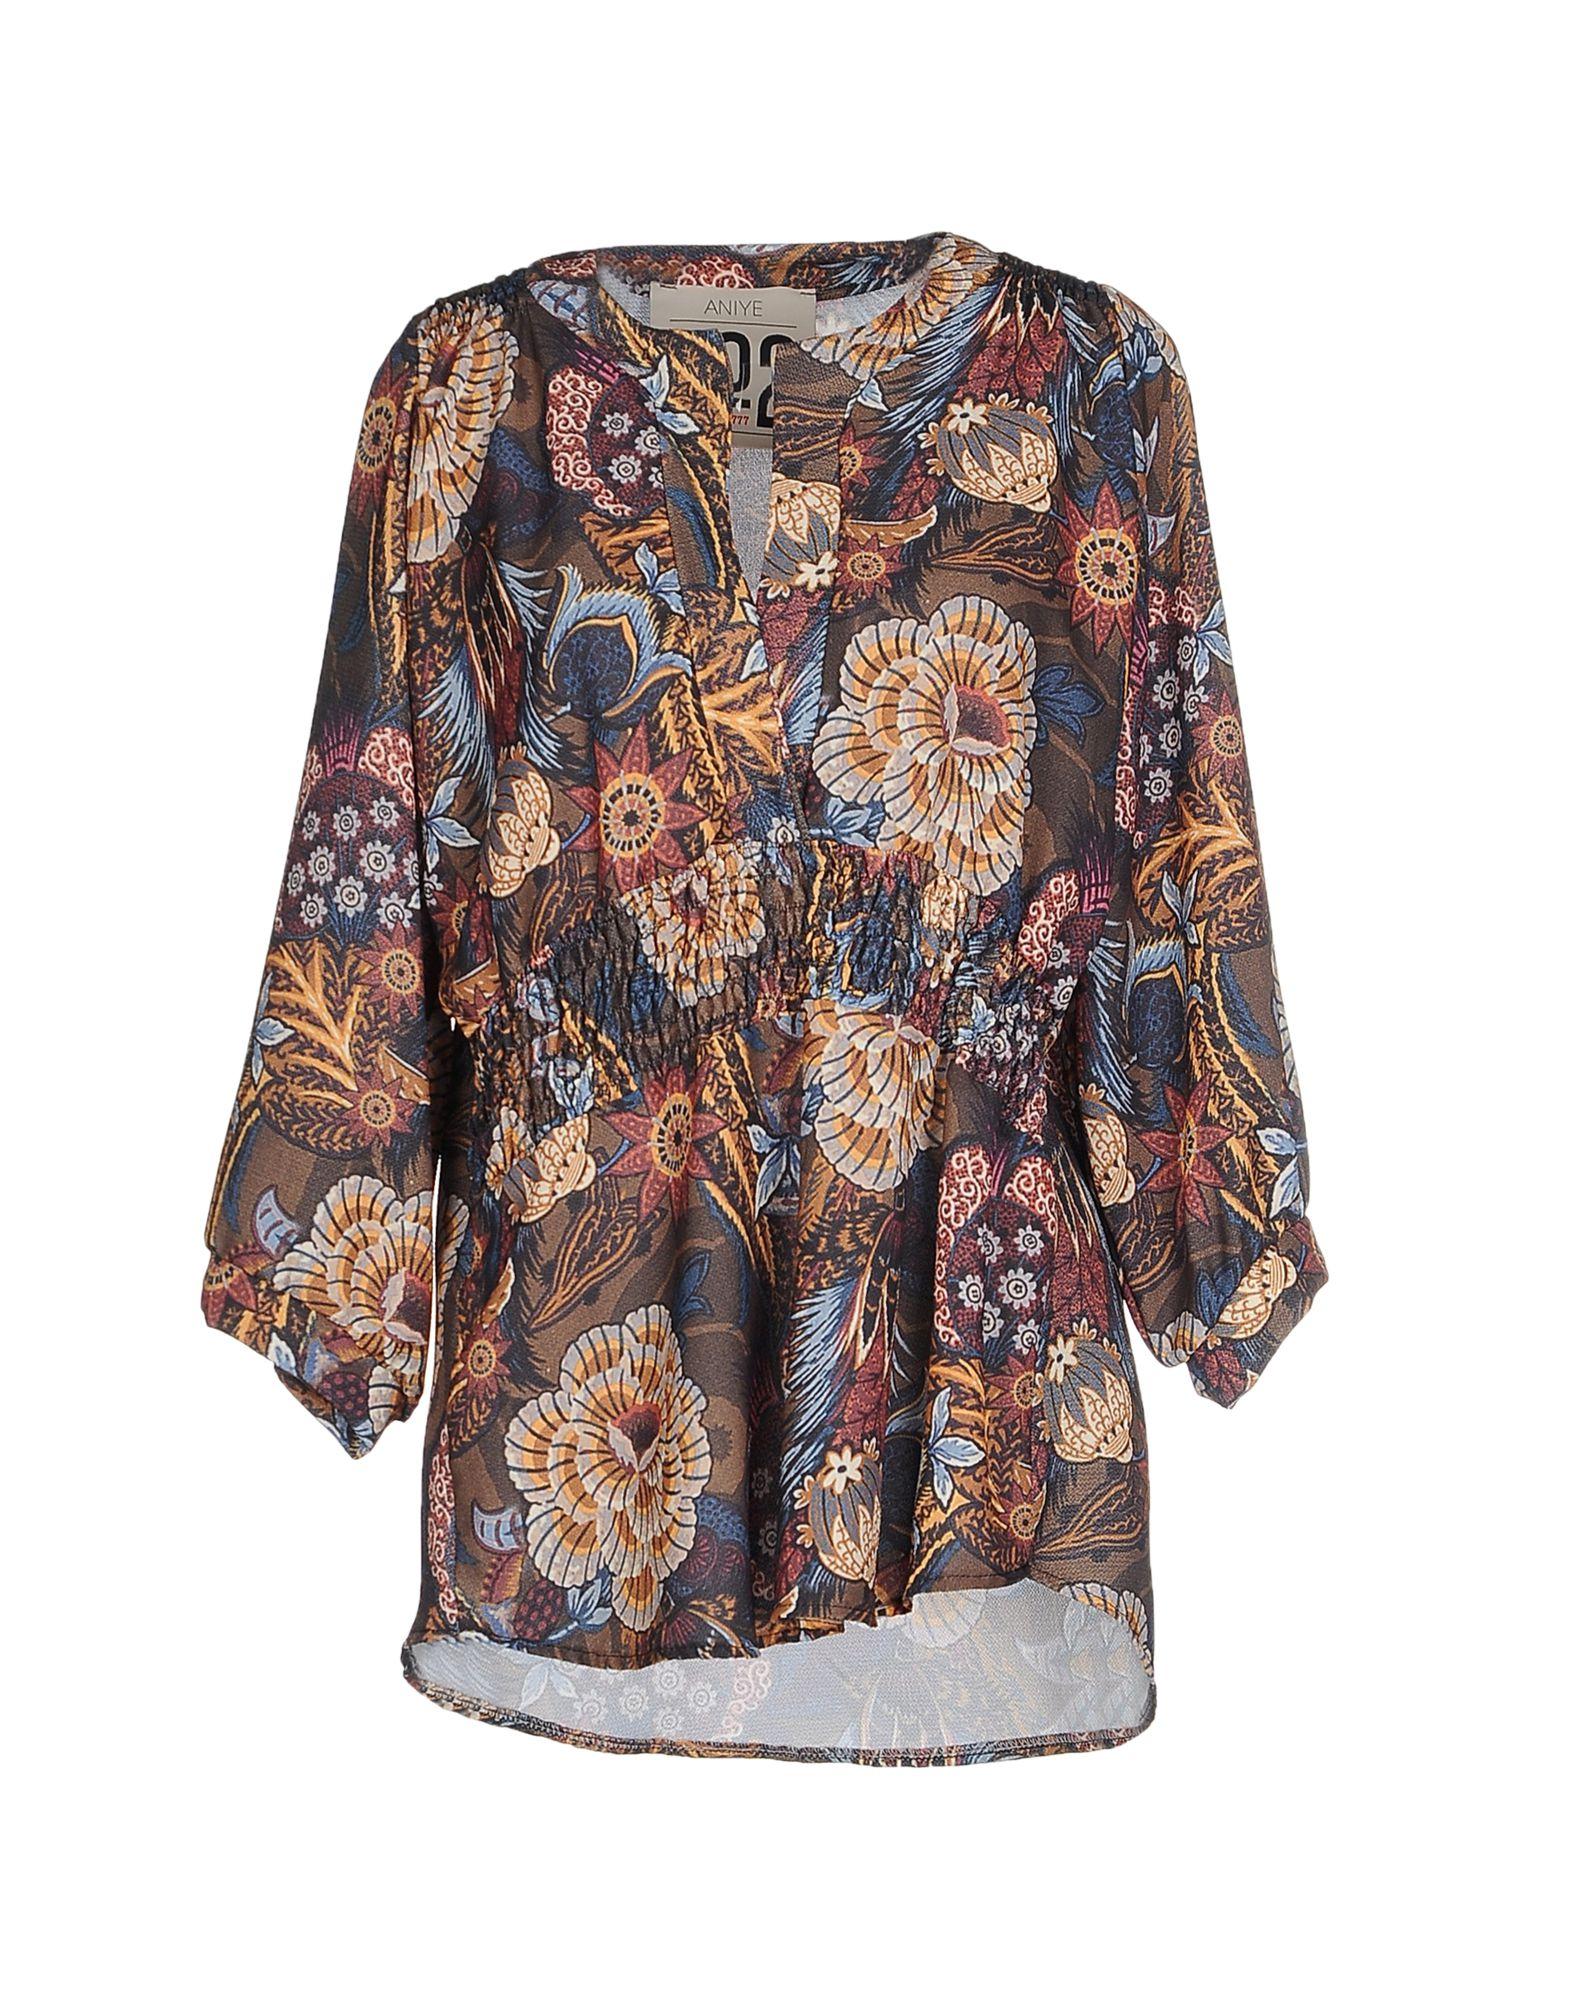 ANIYE N°2 Damen Bluse Farbe Militärgrün Größe 2